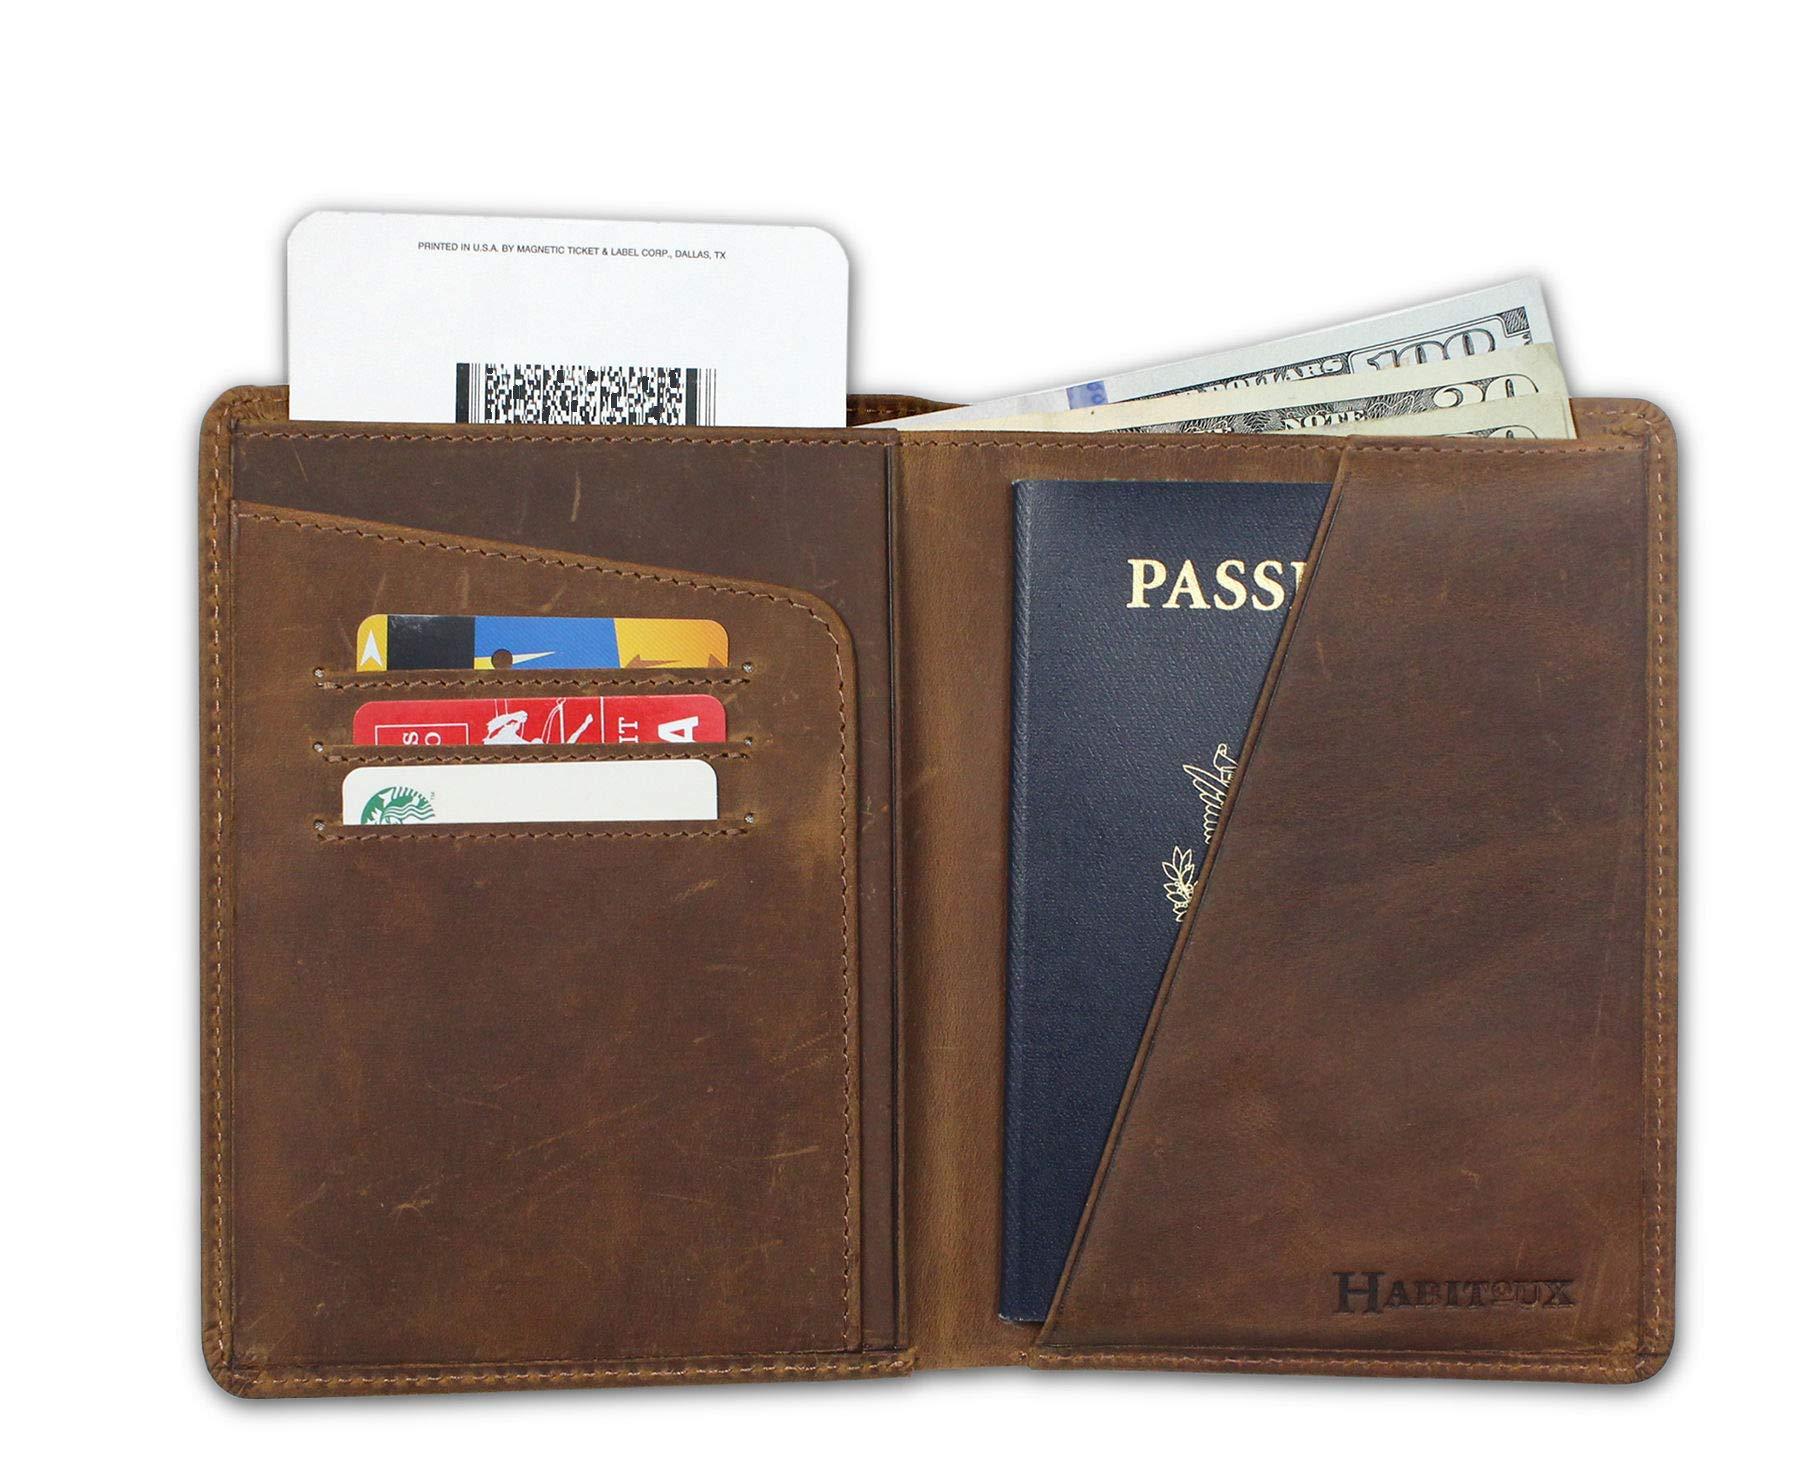 Habitoux, RFID Blocking Passport Holder Travel Wallet - Genuine Crazy Horse Leather, Brown, Free by Habitoux